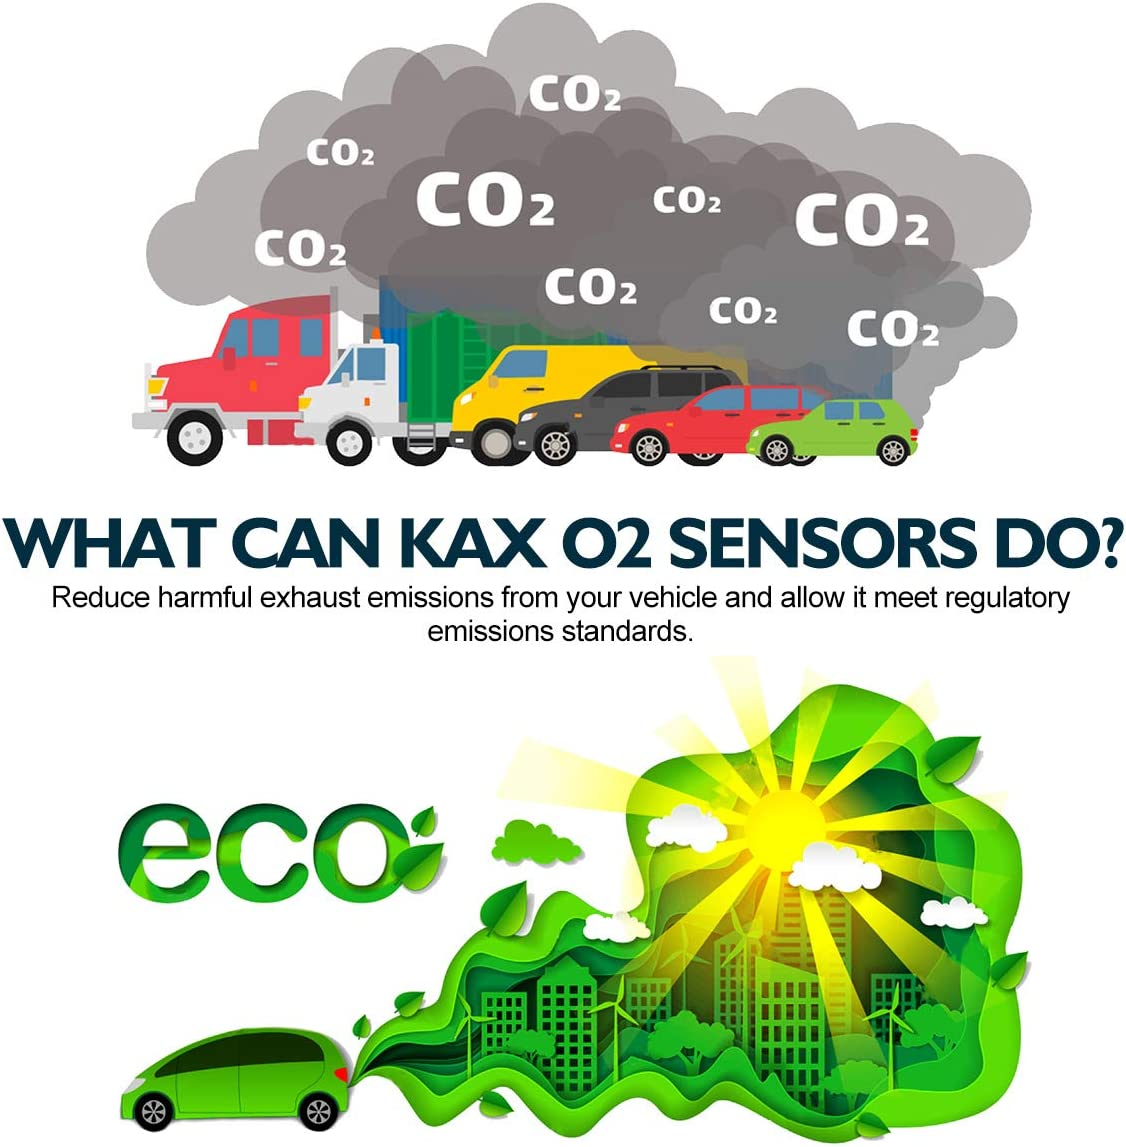 Downstream 250-24121 Heated O2 Sensor Air Fuel Ratio Sensor 1 Sensor 2 Rear Front Original Equipment Replacement 1Pcs KAX 234-4092 Oxygen Sensor